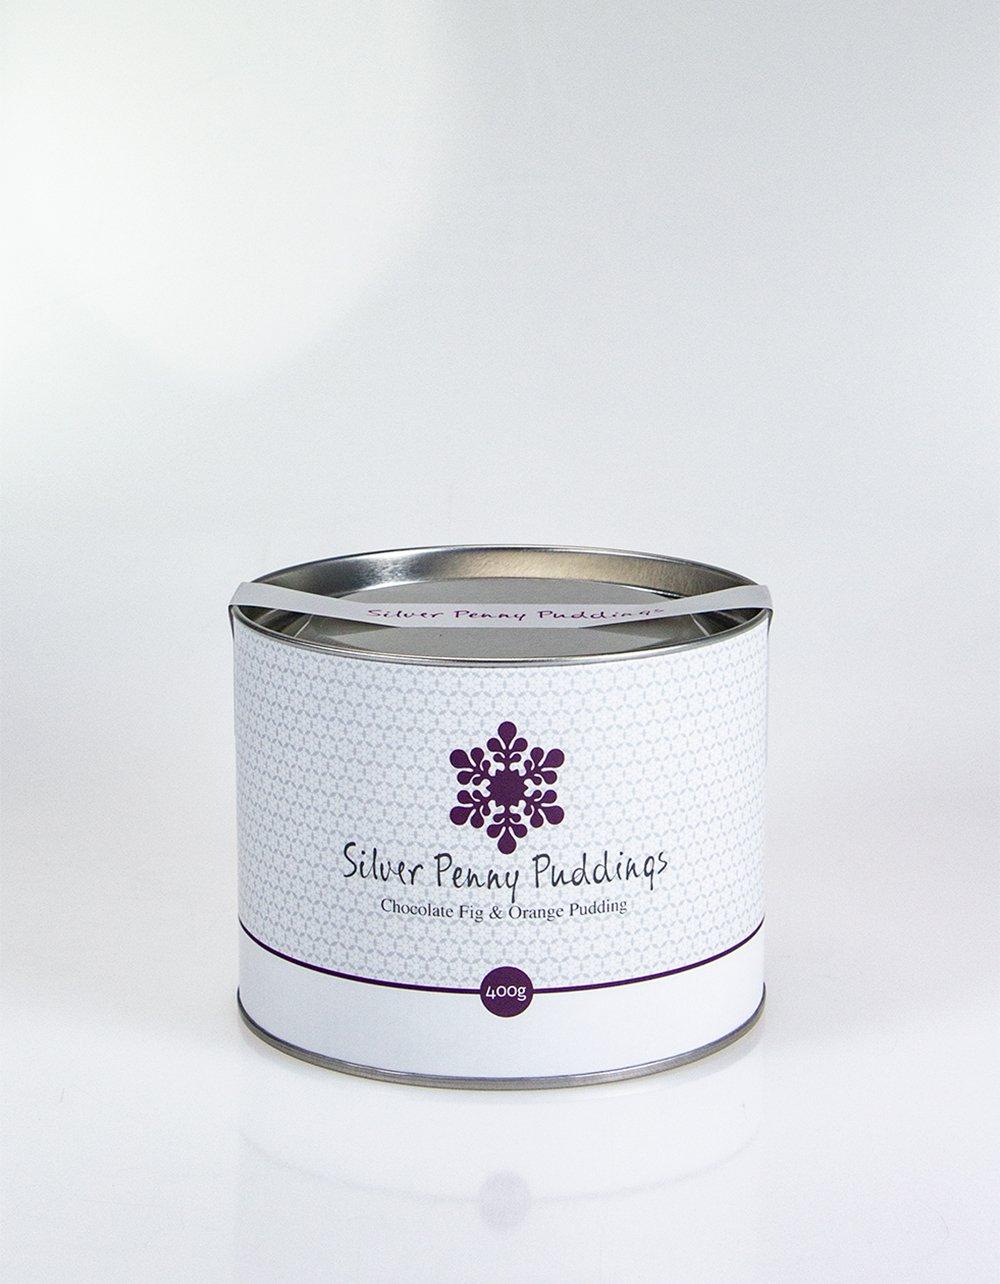 Australian Silver Penny Puddings Chocolate Fig & Orange Pudding 400g